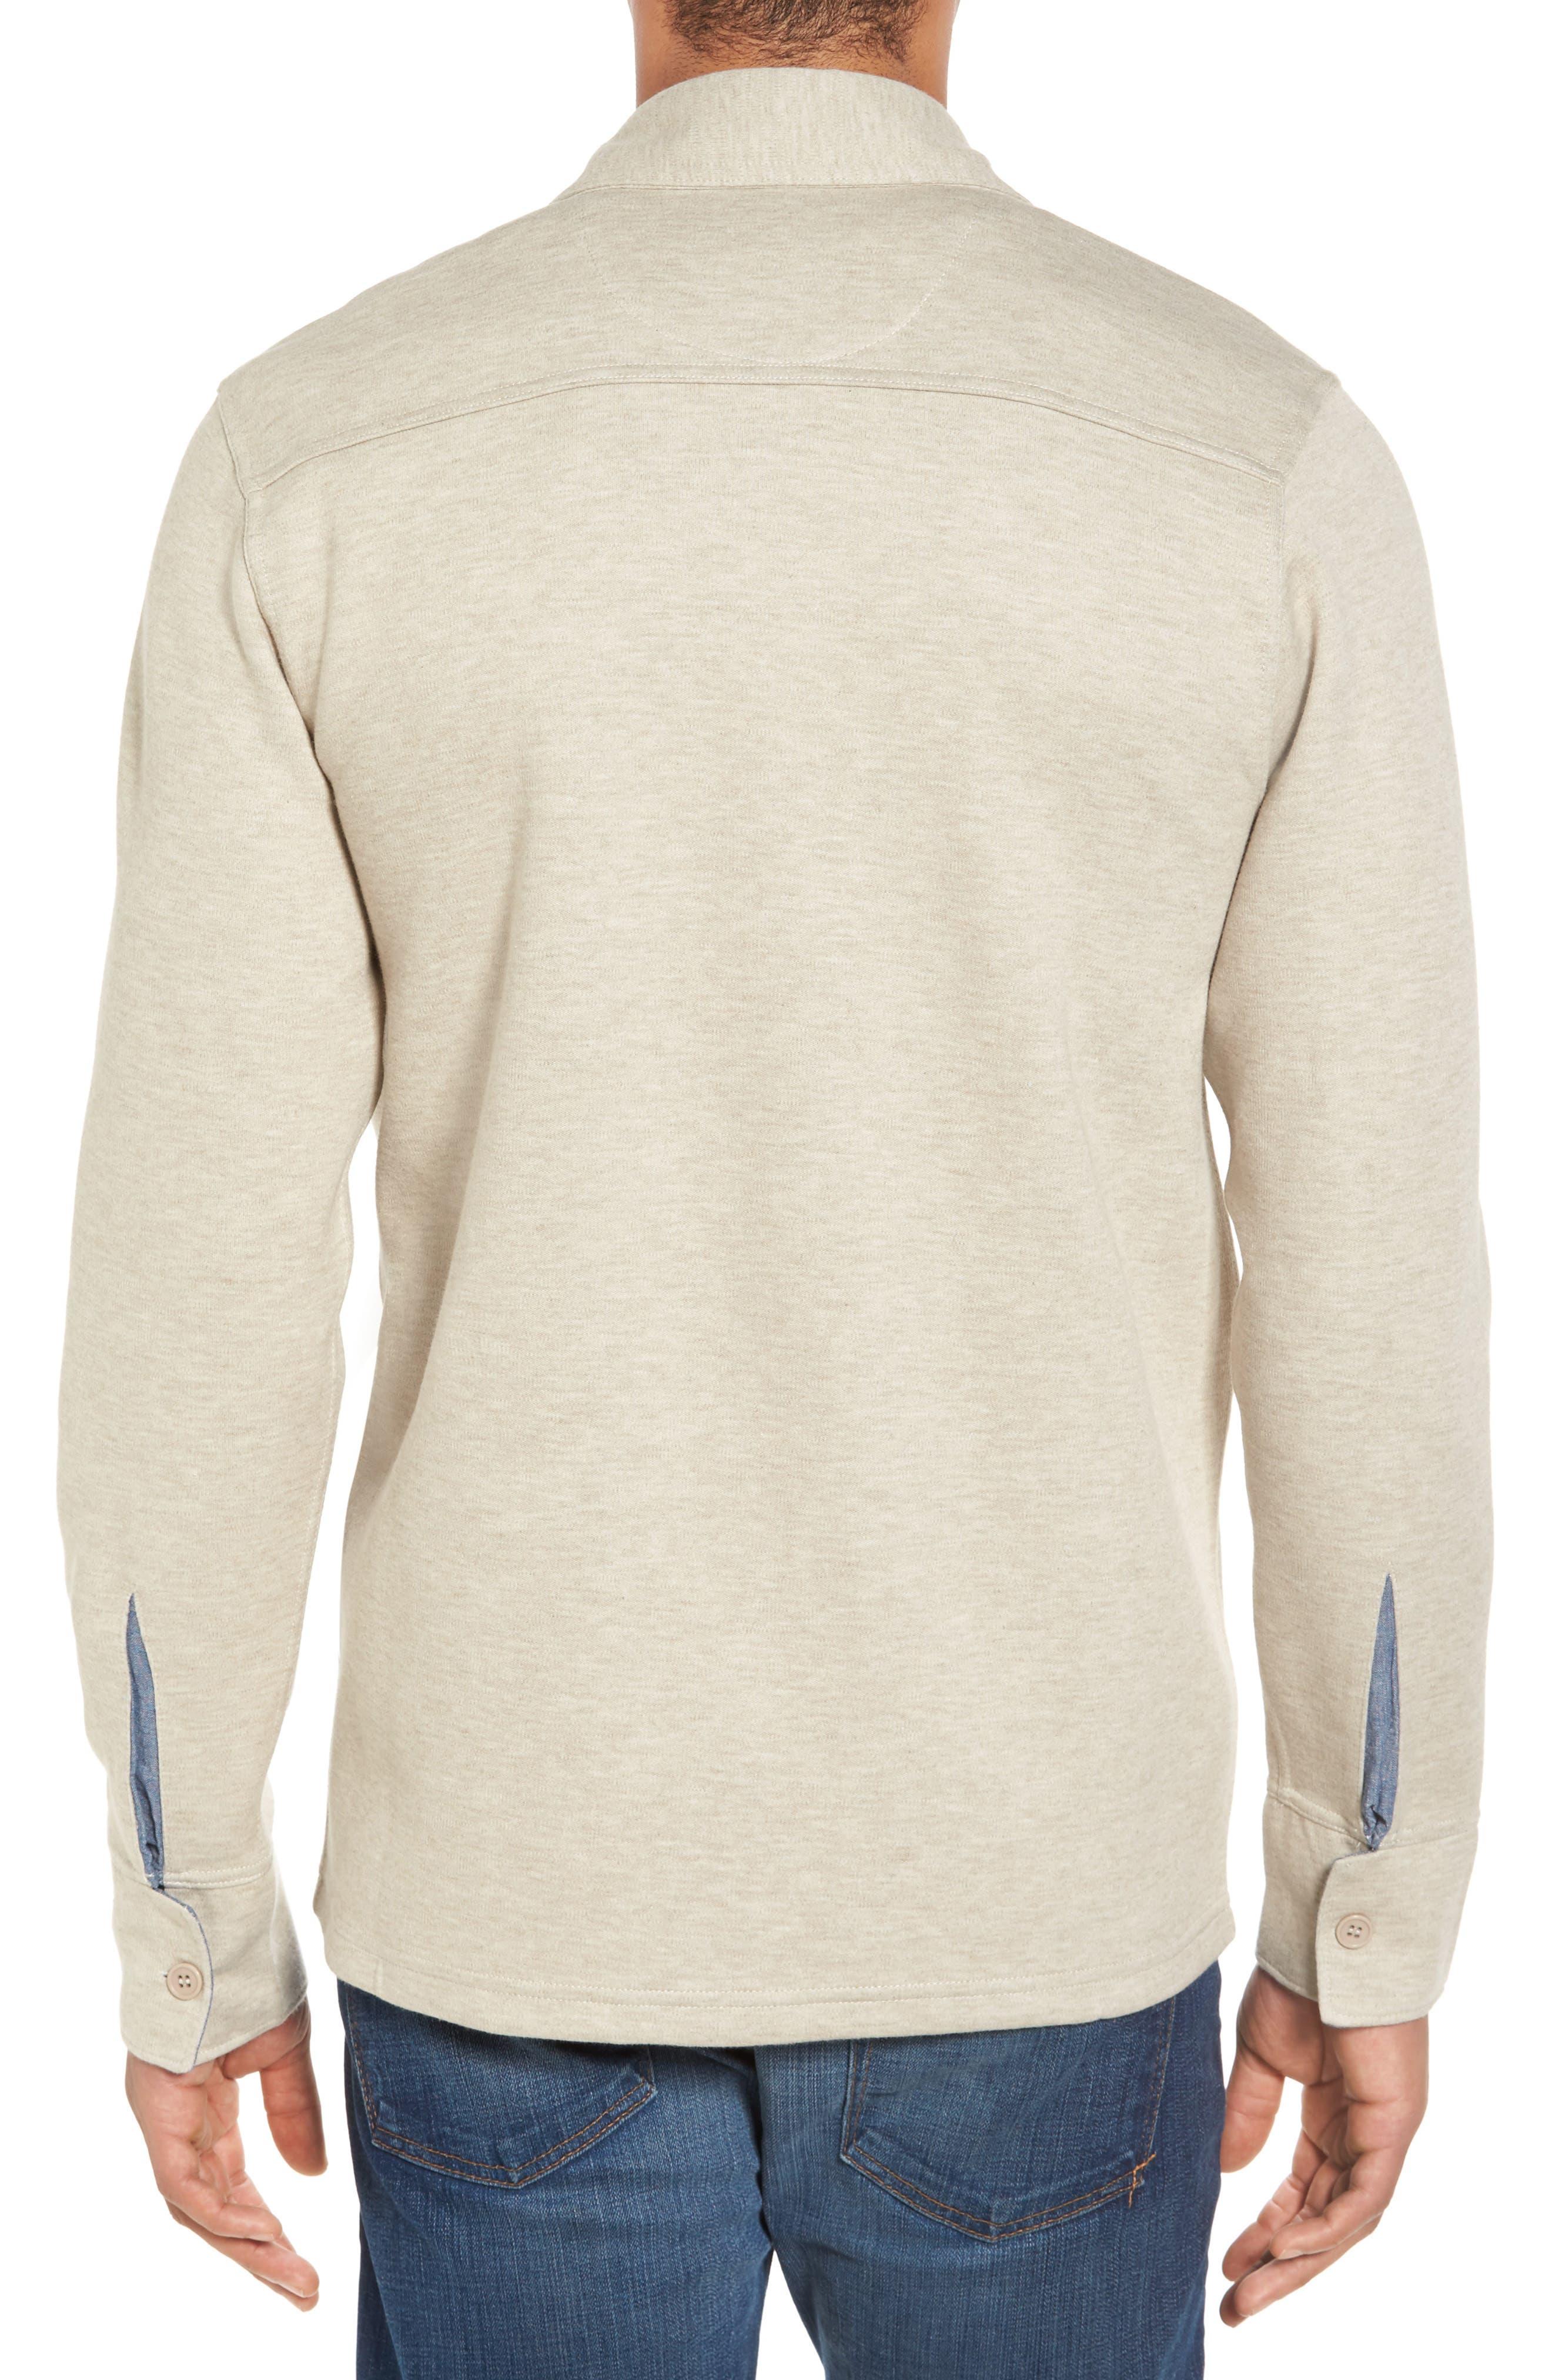 'Longitude' Flap Pocket Fleece Shirt,                             Alternate thumbnail 2, color,                             Bamboo Ivory